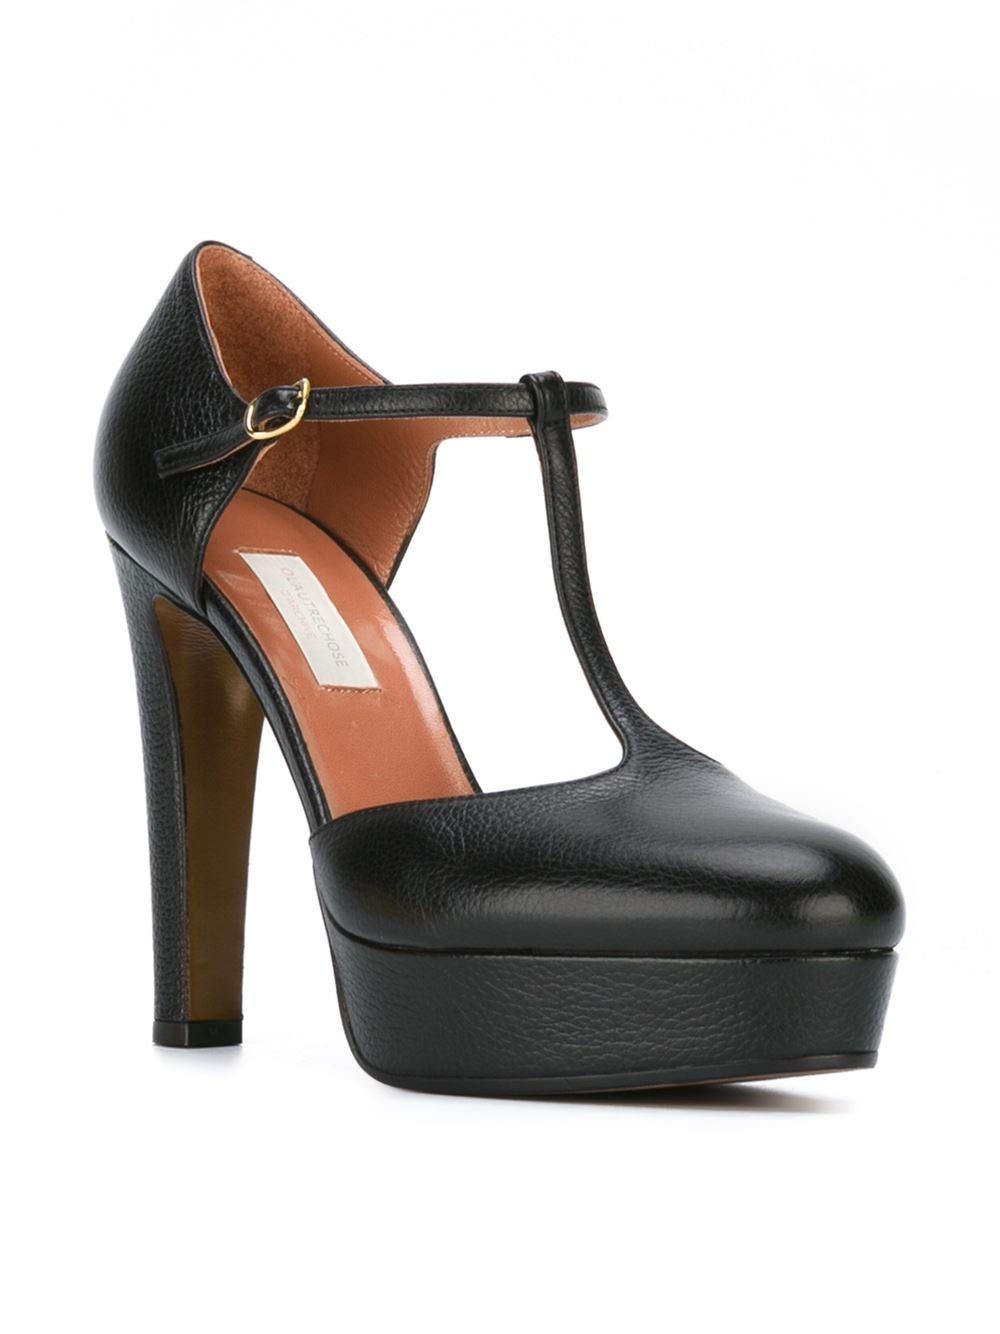 Black Suede Slingback Shoes L'autre Chose MoBMOHKE1E